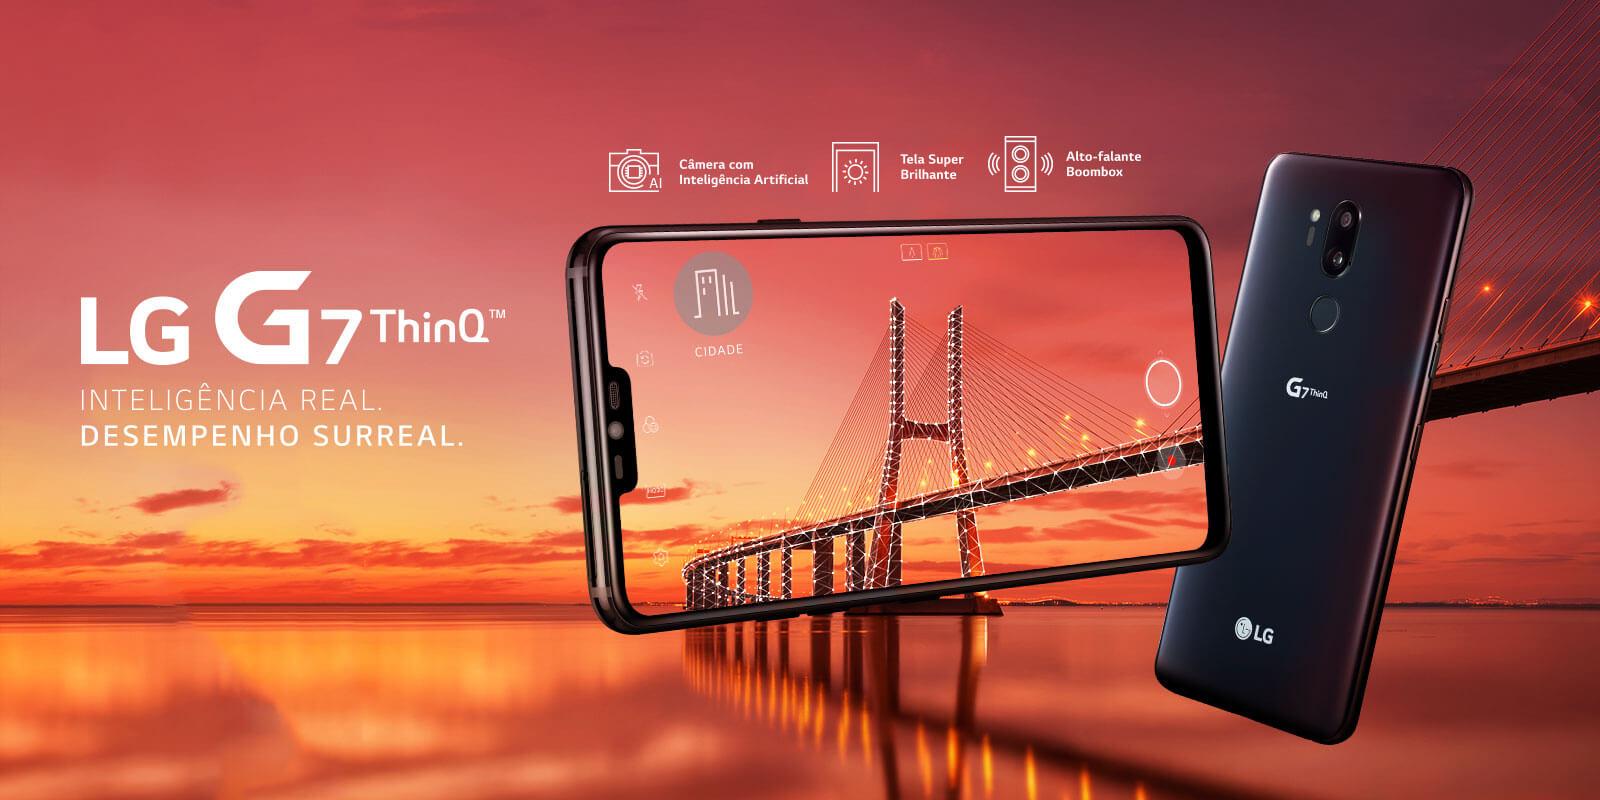 banner g7 thinq - Claro venderá o LG G7 ThinQ por R$ 1.196,00